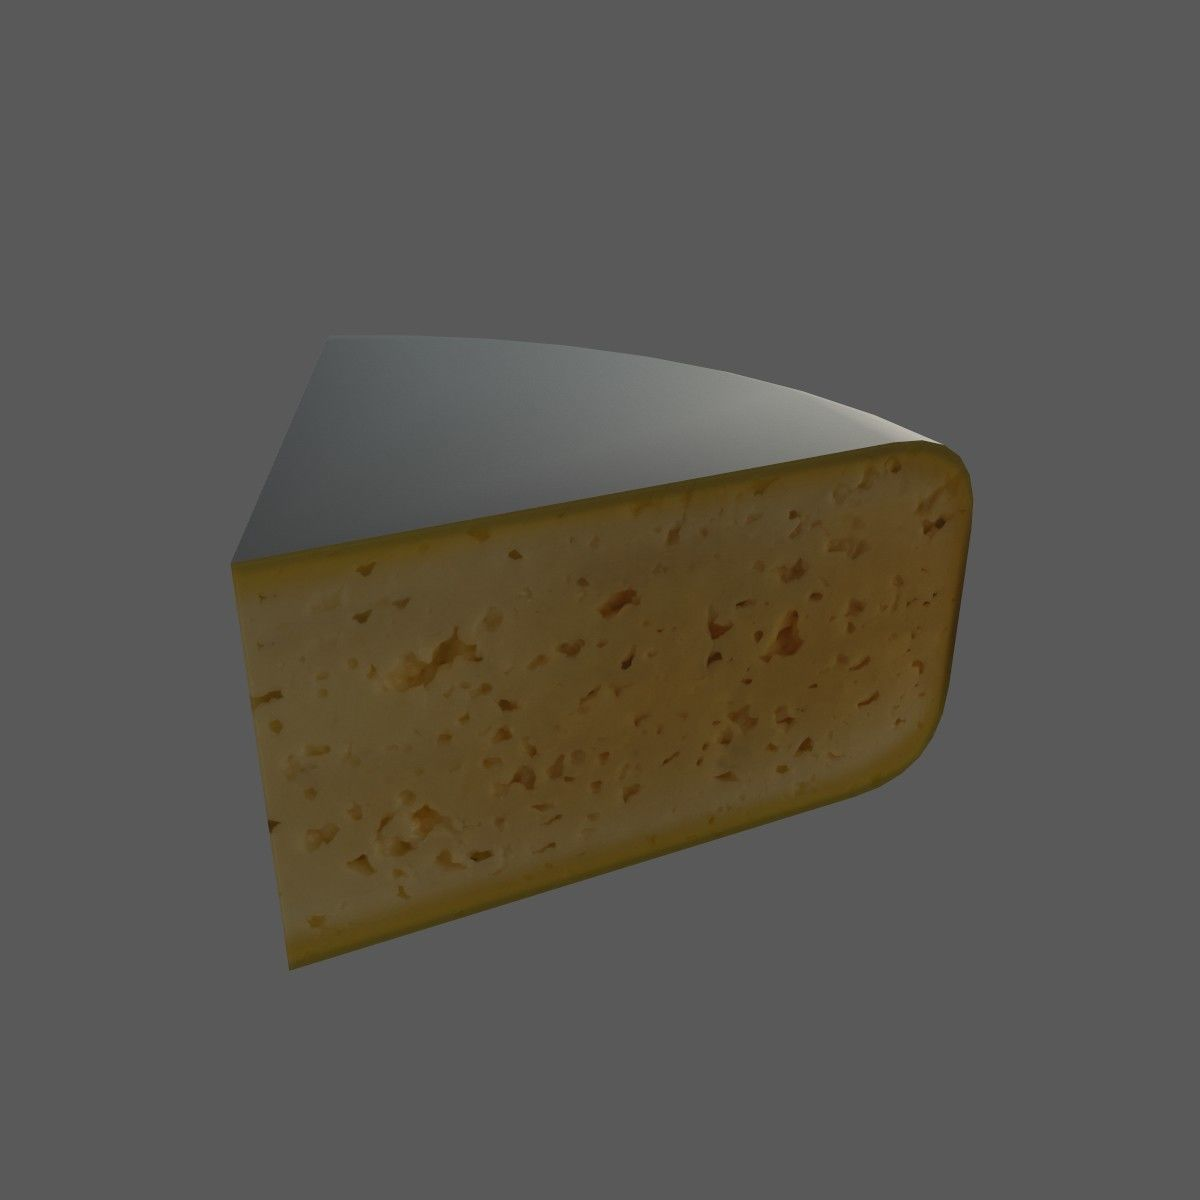 3D Model Cheese VR / AR / Low-poly GLTF USDZ